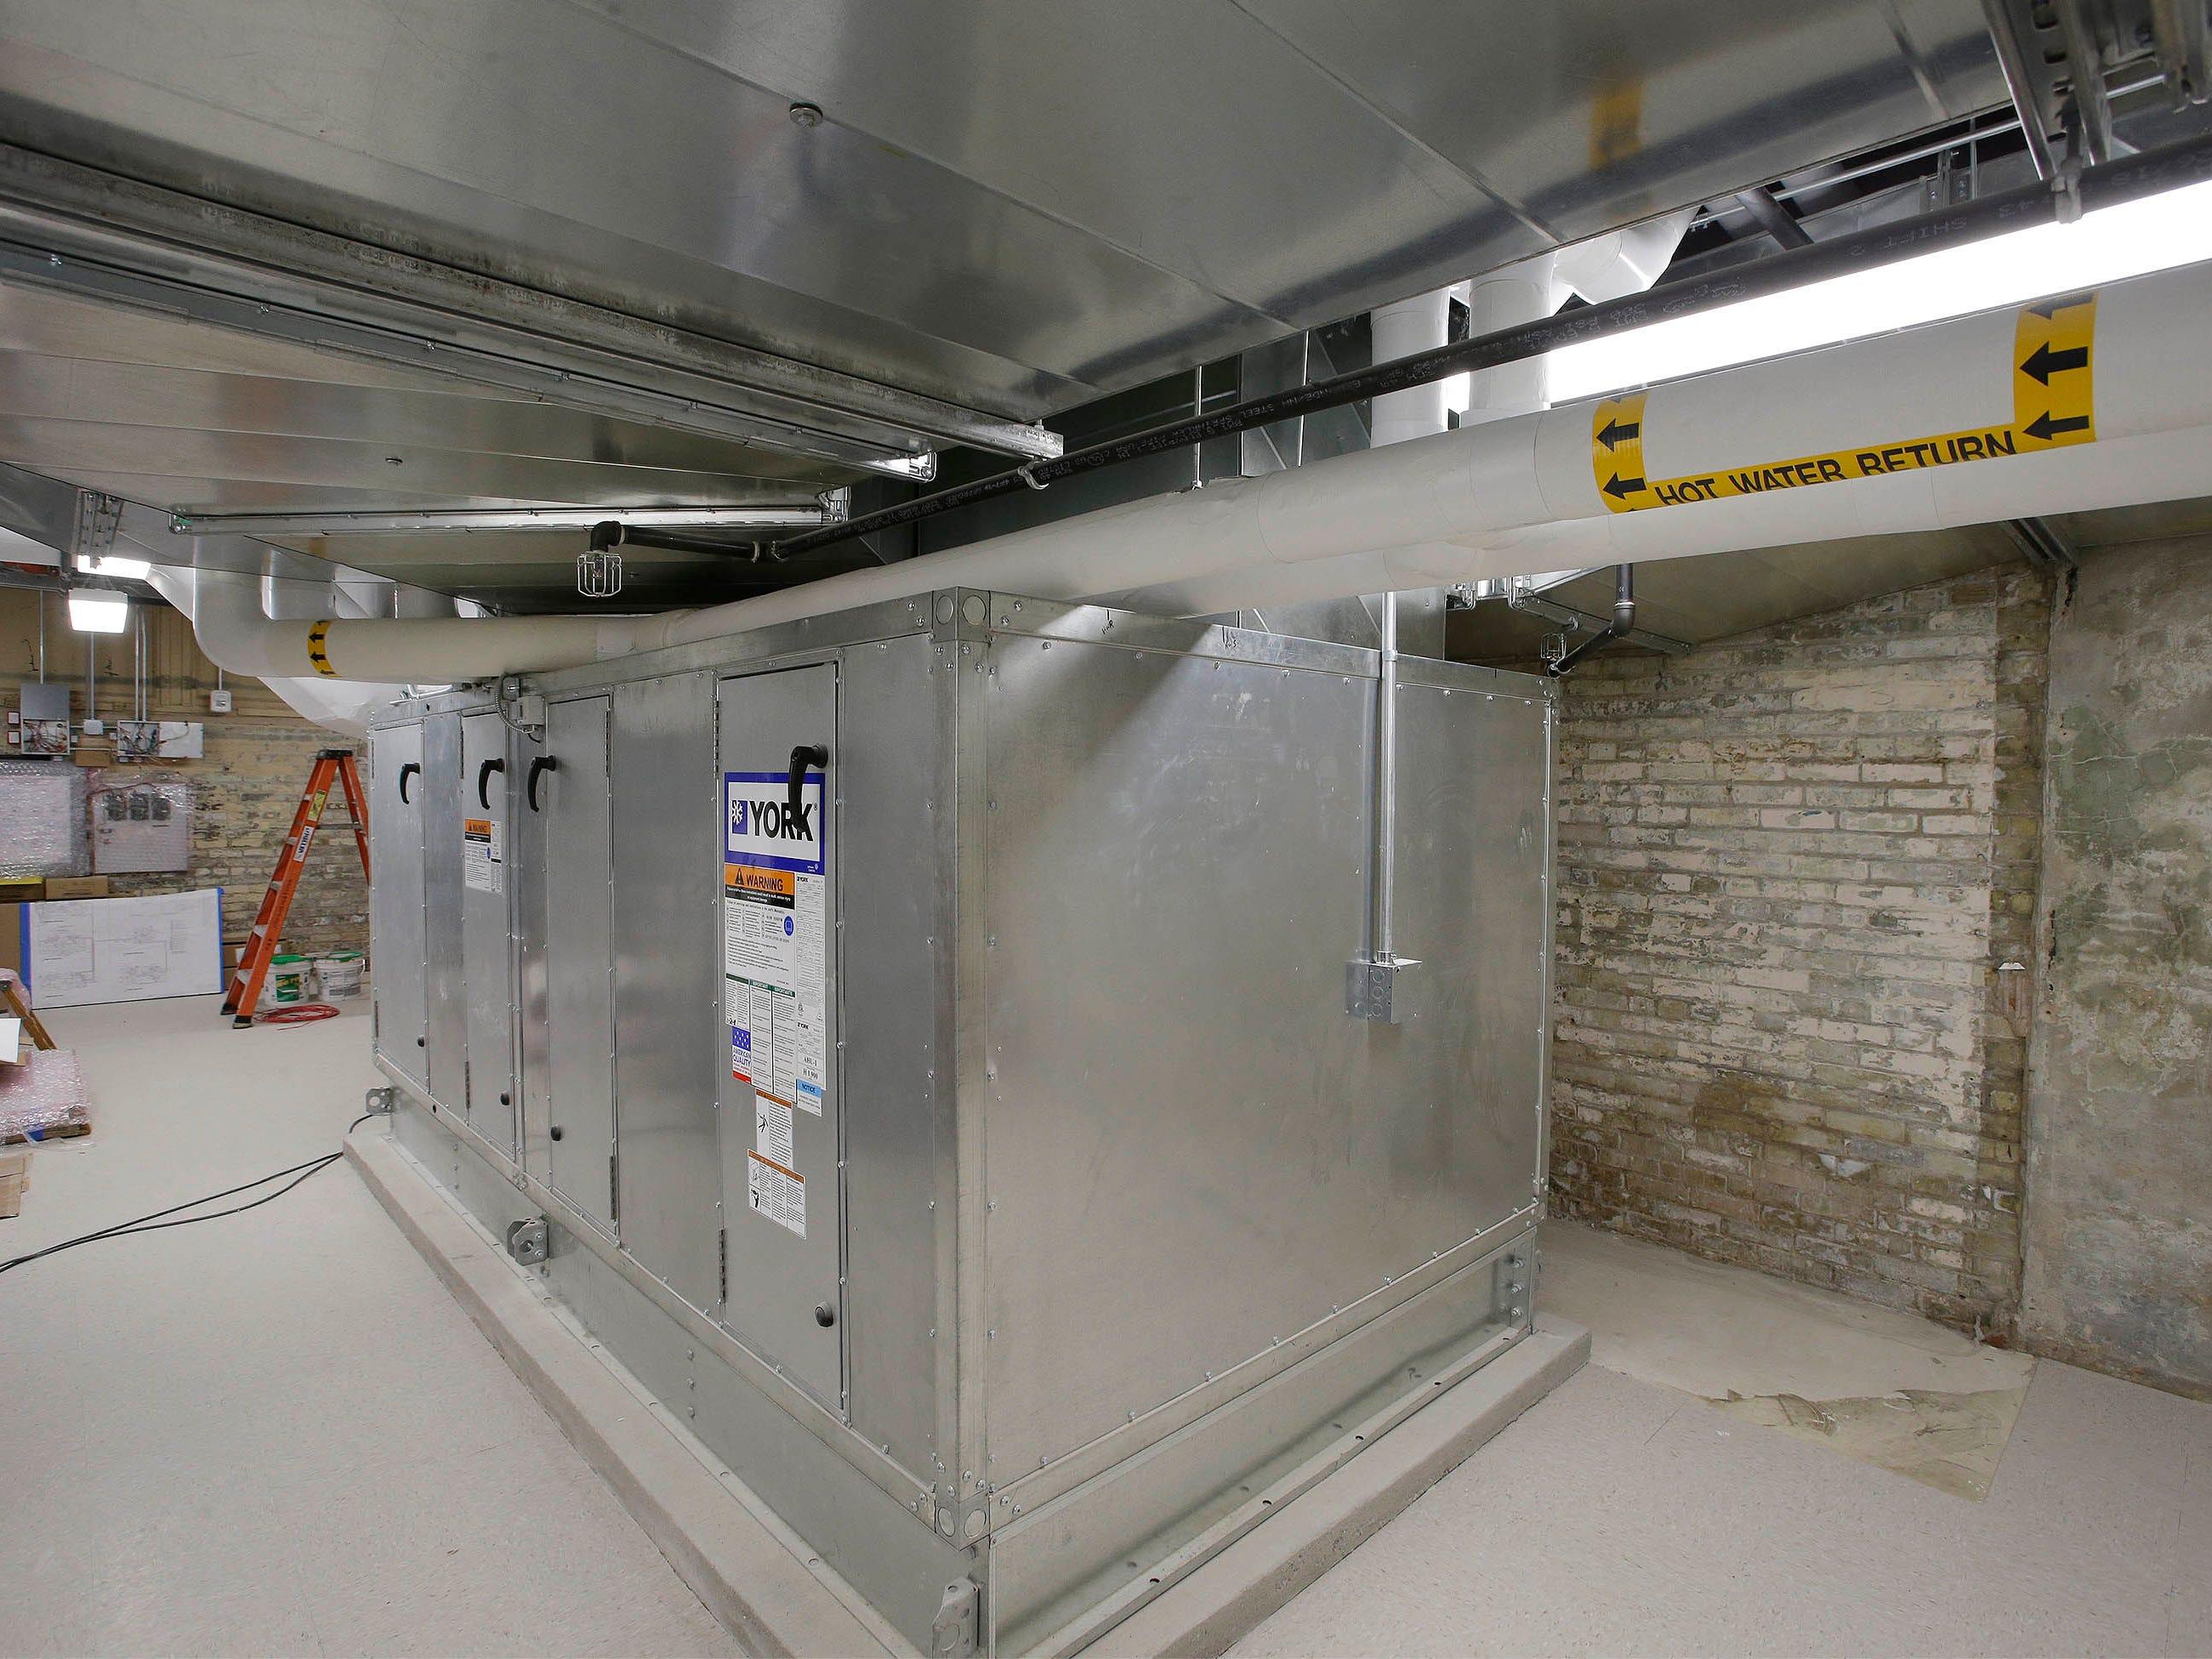 New air handling equipment inside Sheboygan City Hall as seen, Tuesday, May 7, 2019, in Sheboygan, Wis.